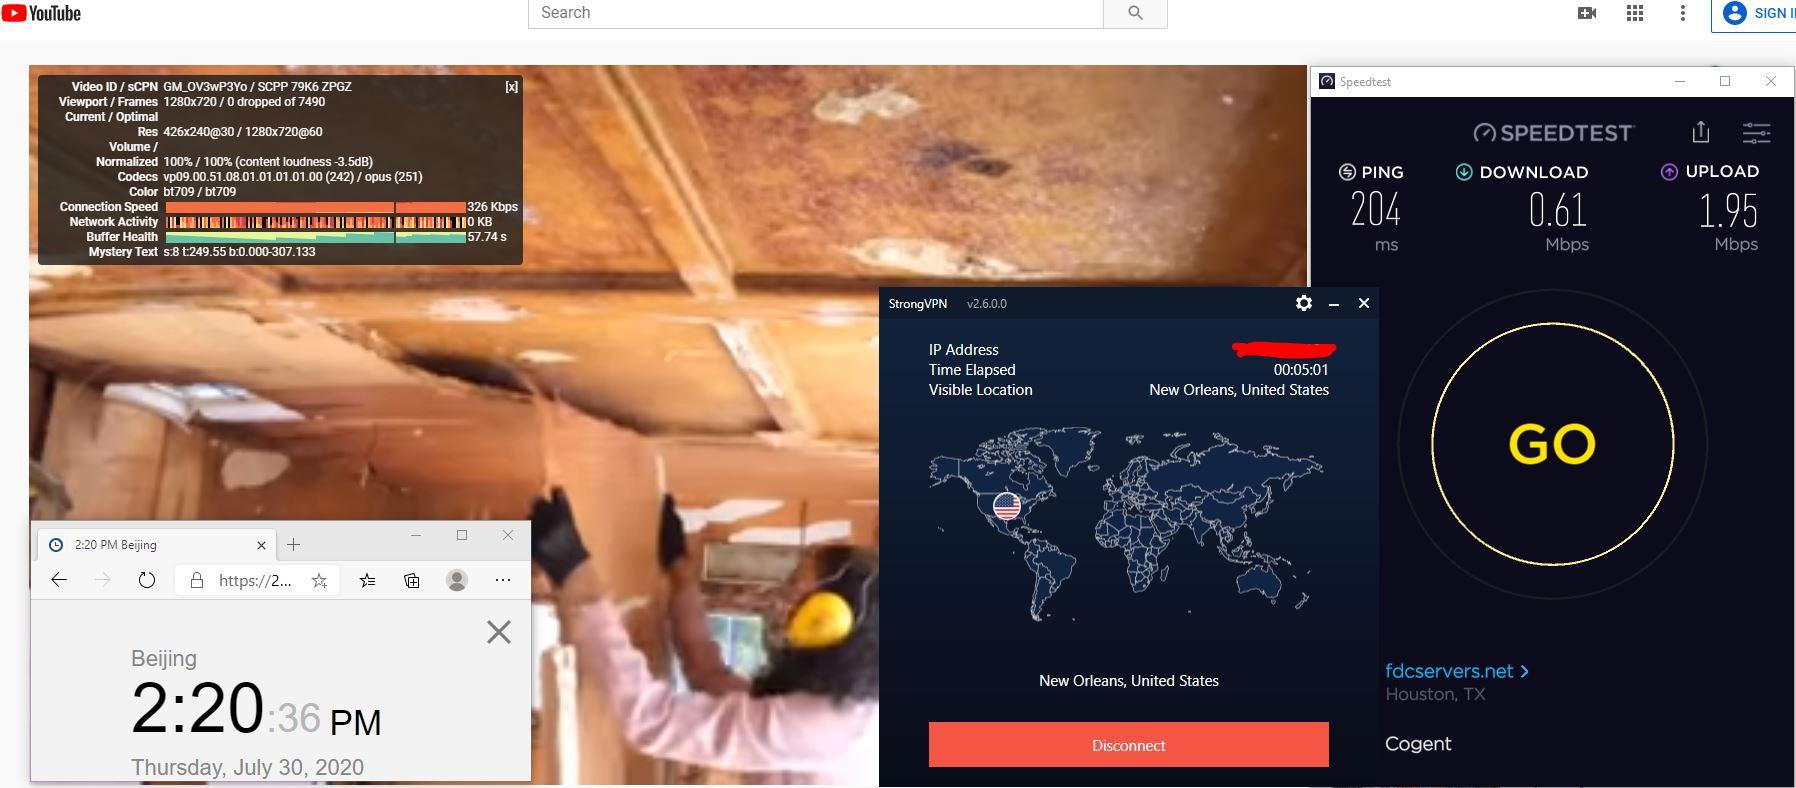 Windows10 StrongVPN 中国VPN 翻墙 科学上网 翻墙速度测试 - 20200730